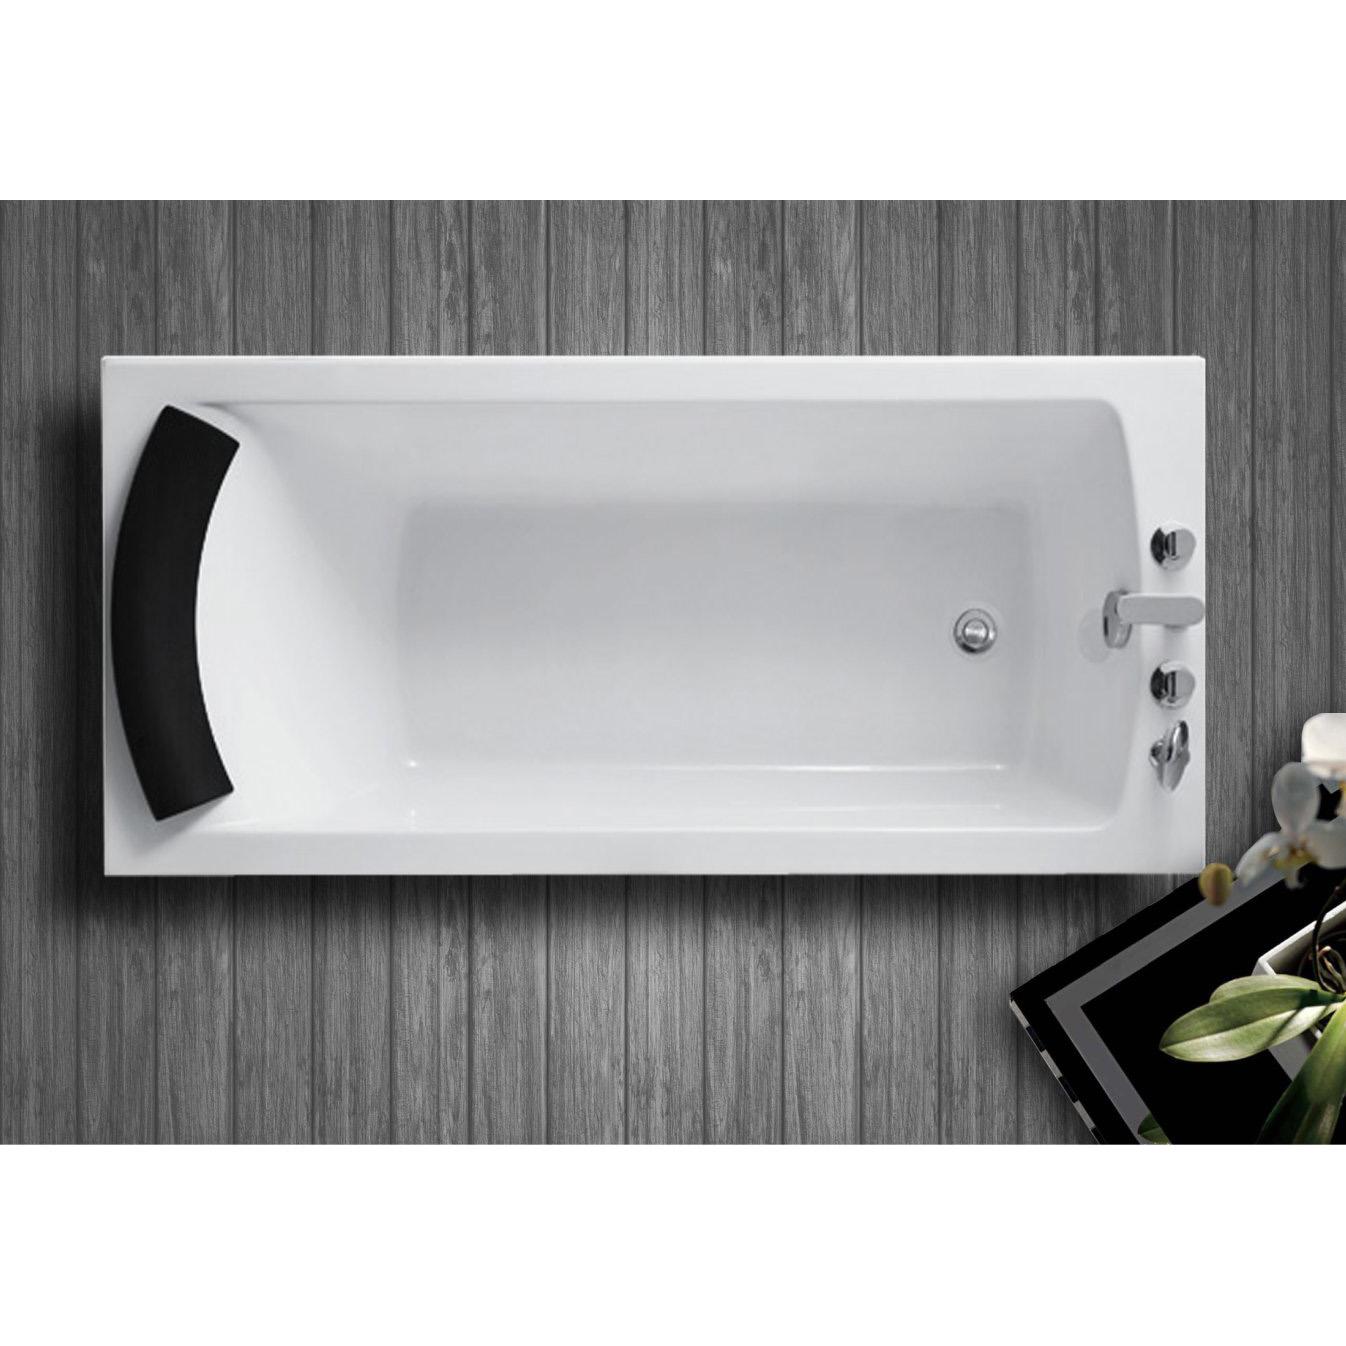 Акриловая ванна Royal bath Vienna RB953200 140х70 vienna 1 15 000